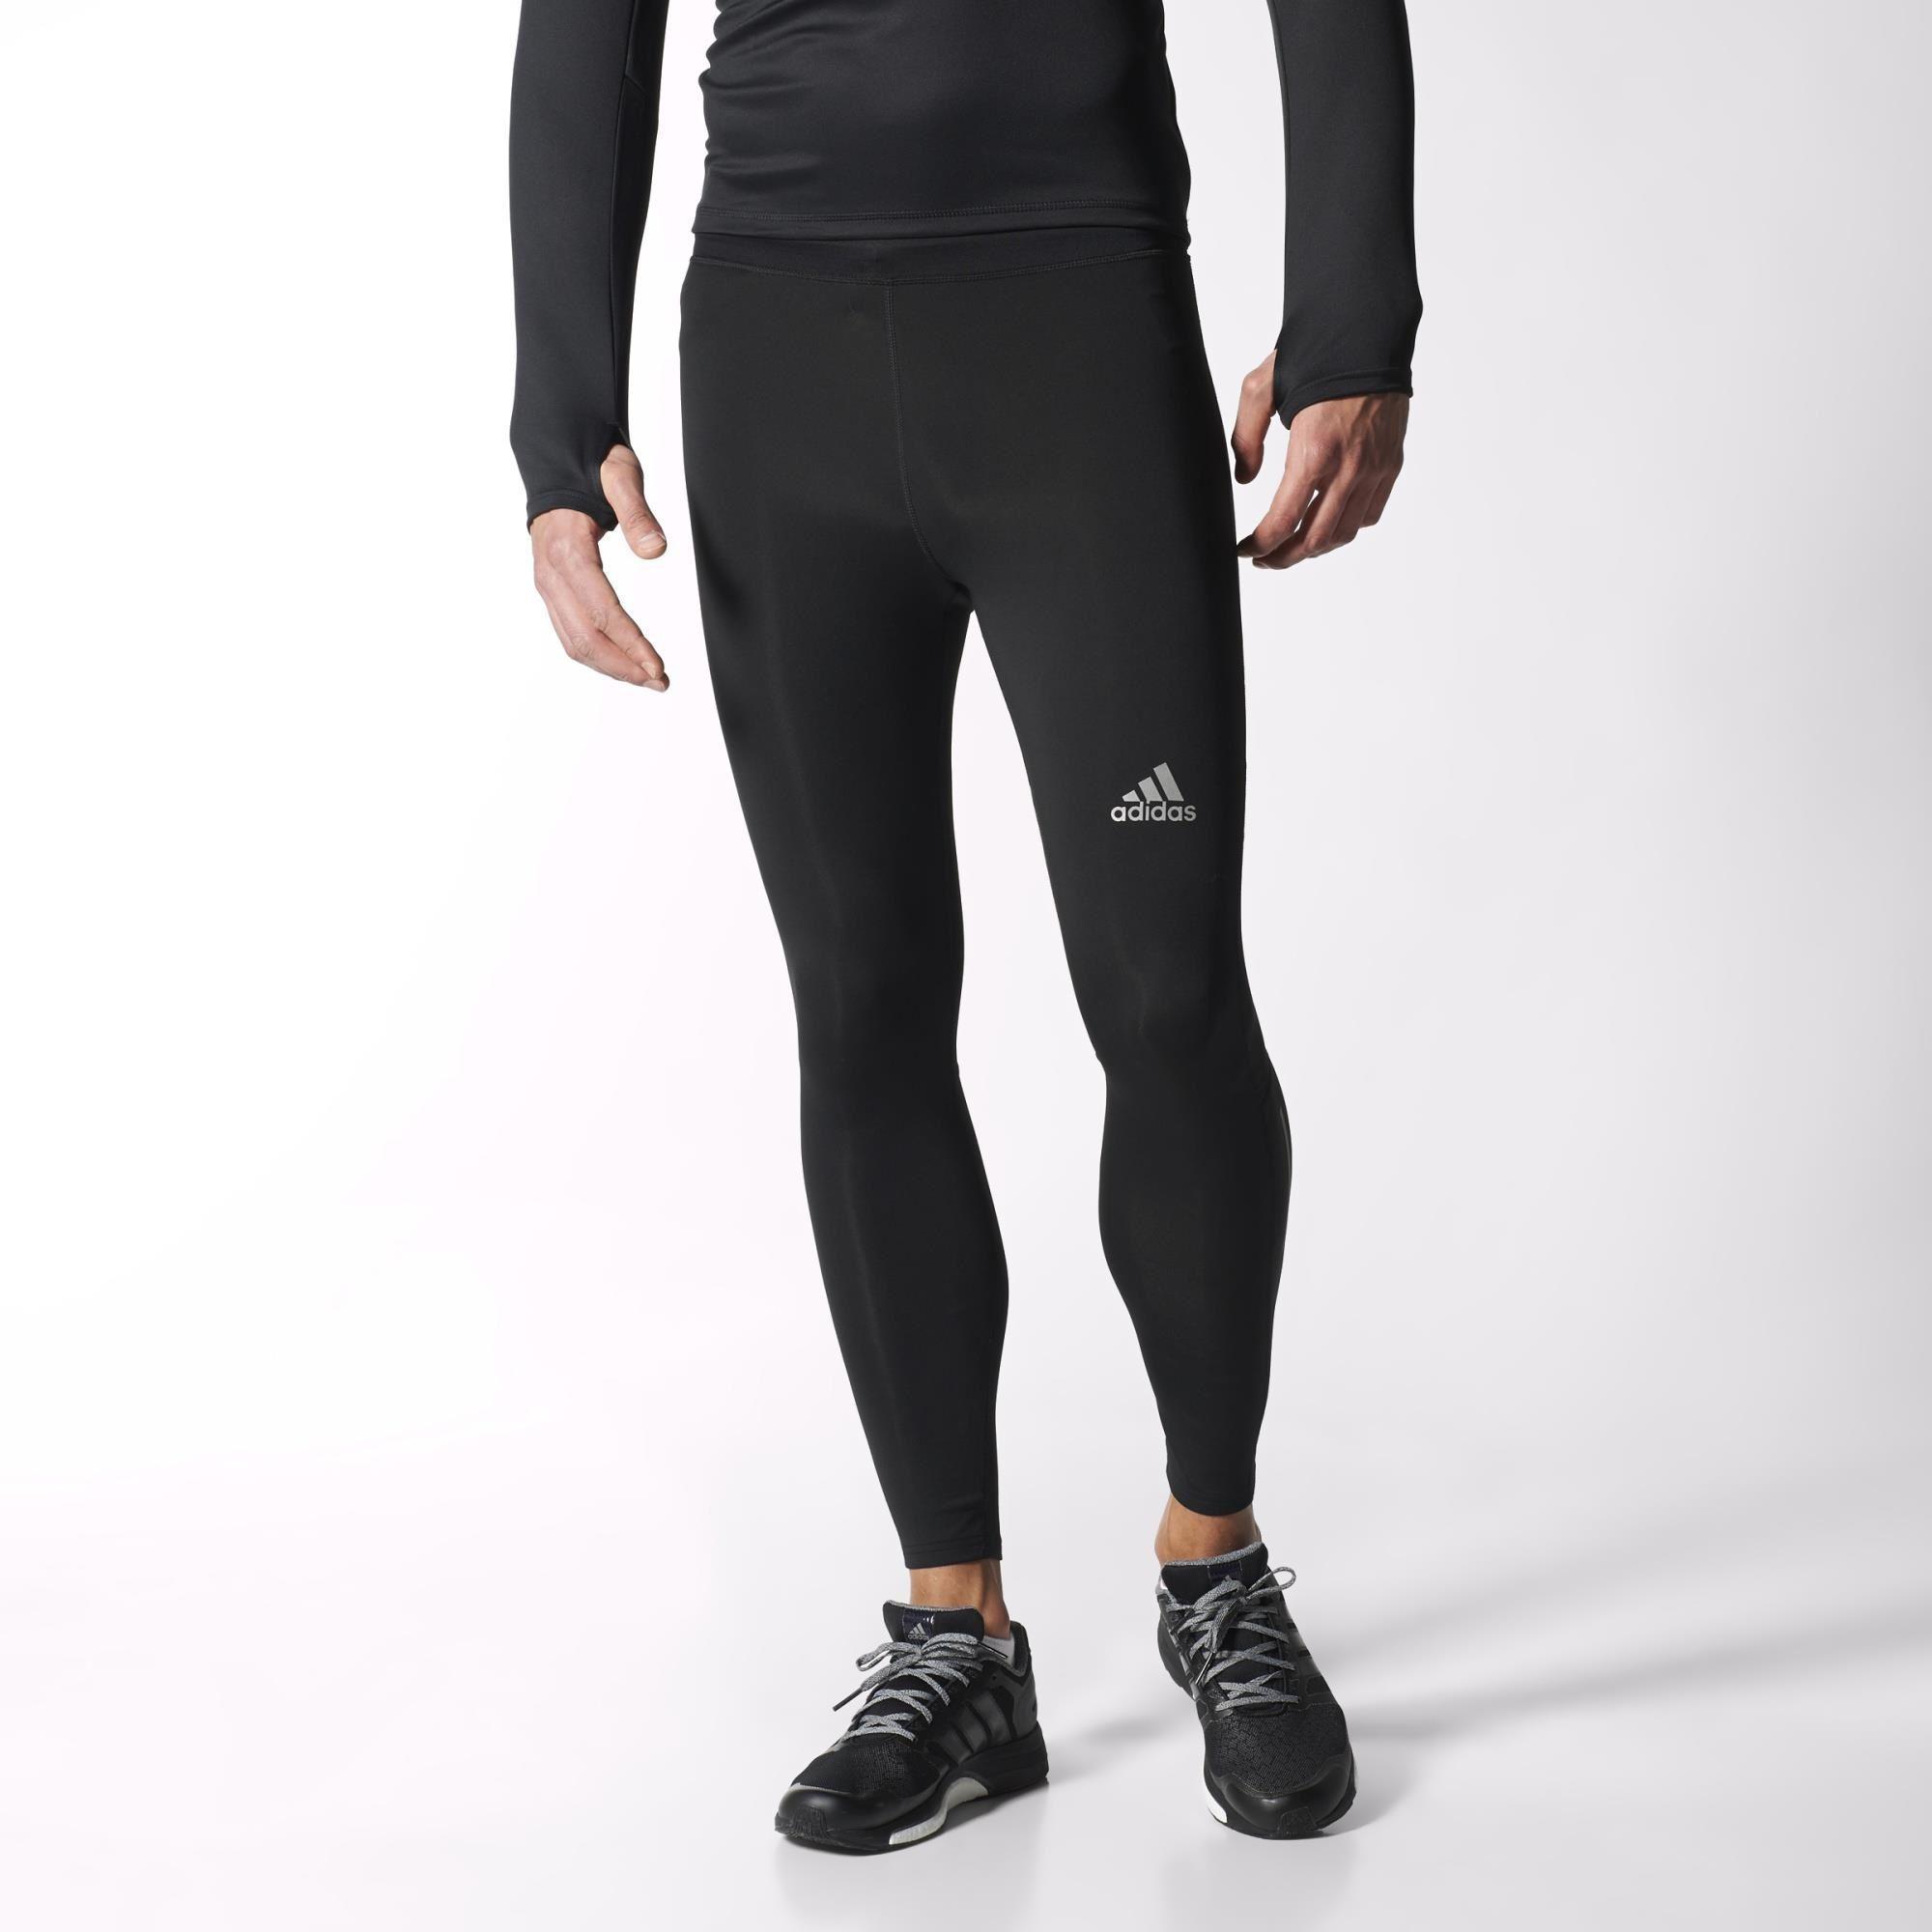 0674e37672546 Adidas Mens Sequencials Climalite Tights - Black - Tennisnuts.com